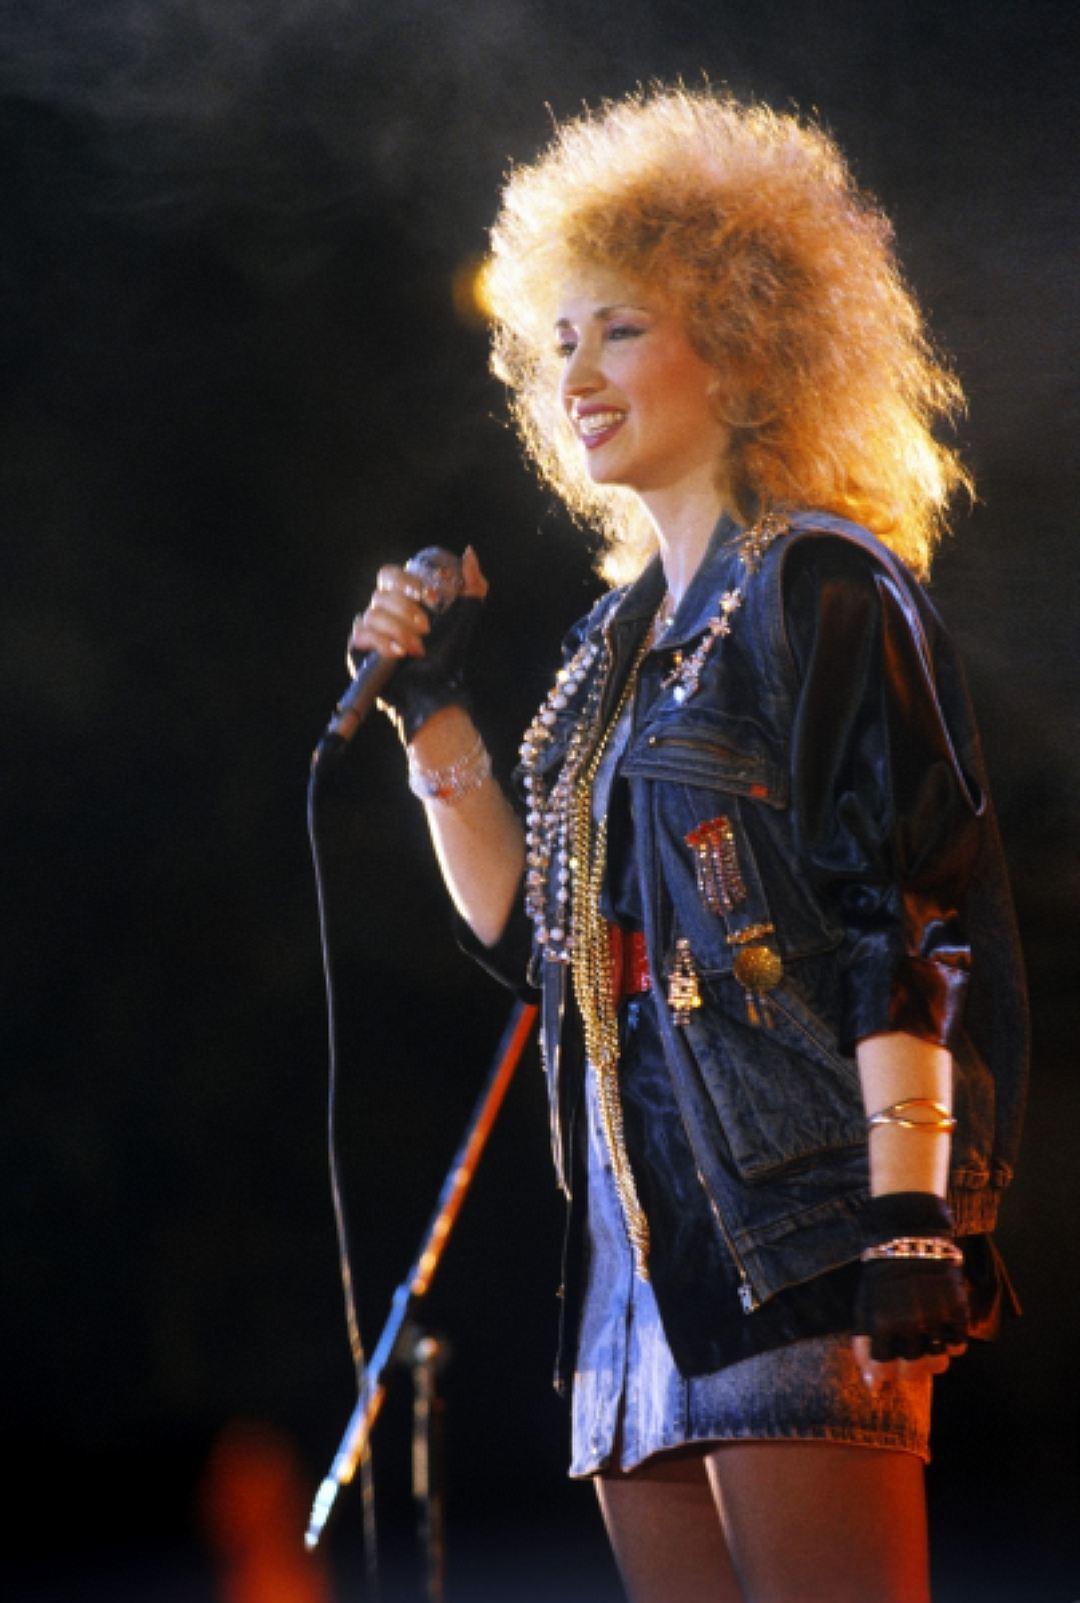 Ирина Аллегрова (фото 1988 года) — одна из законодательниц моды конца 80-х — начала 90-х. Символами